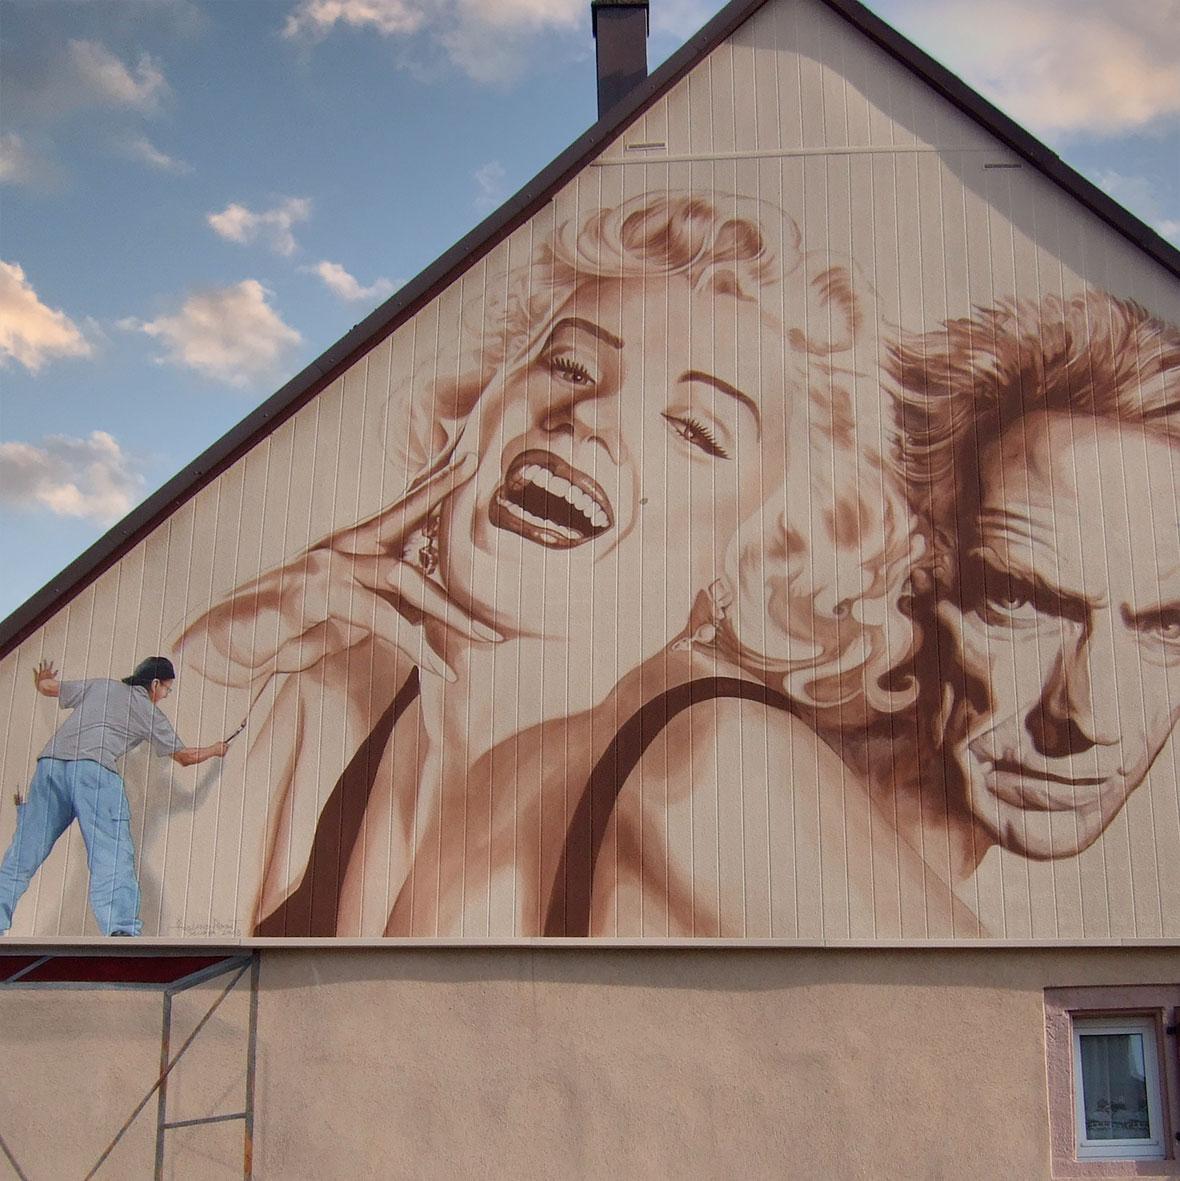 Marilyn et Clint Eastwood à Wisches. Fresque de Roland Perret. illusions-murales.com